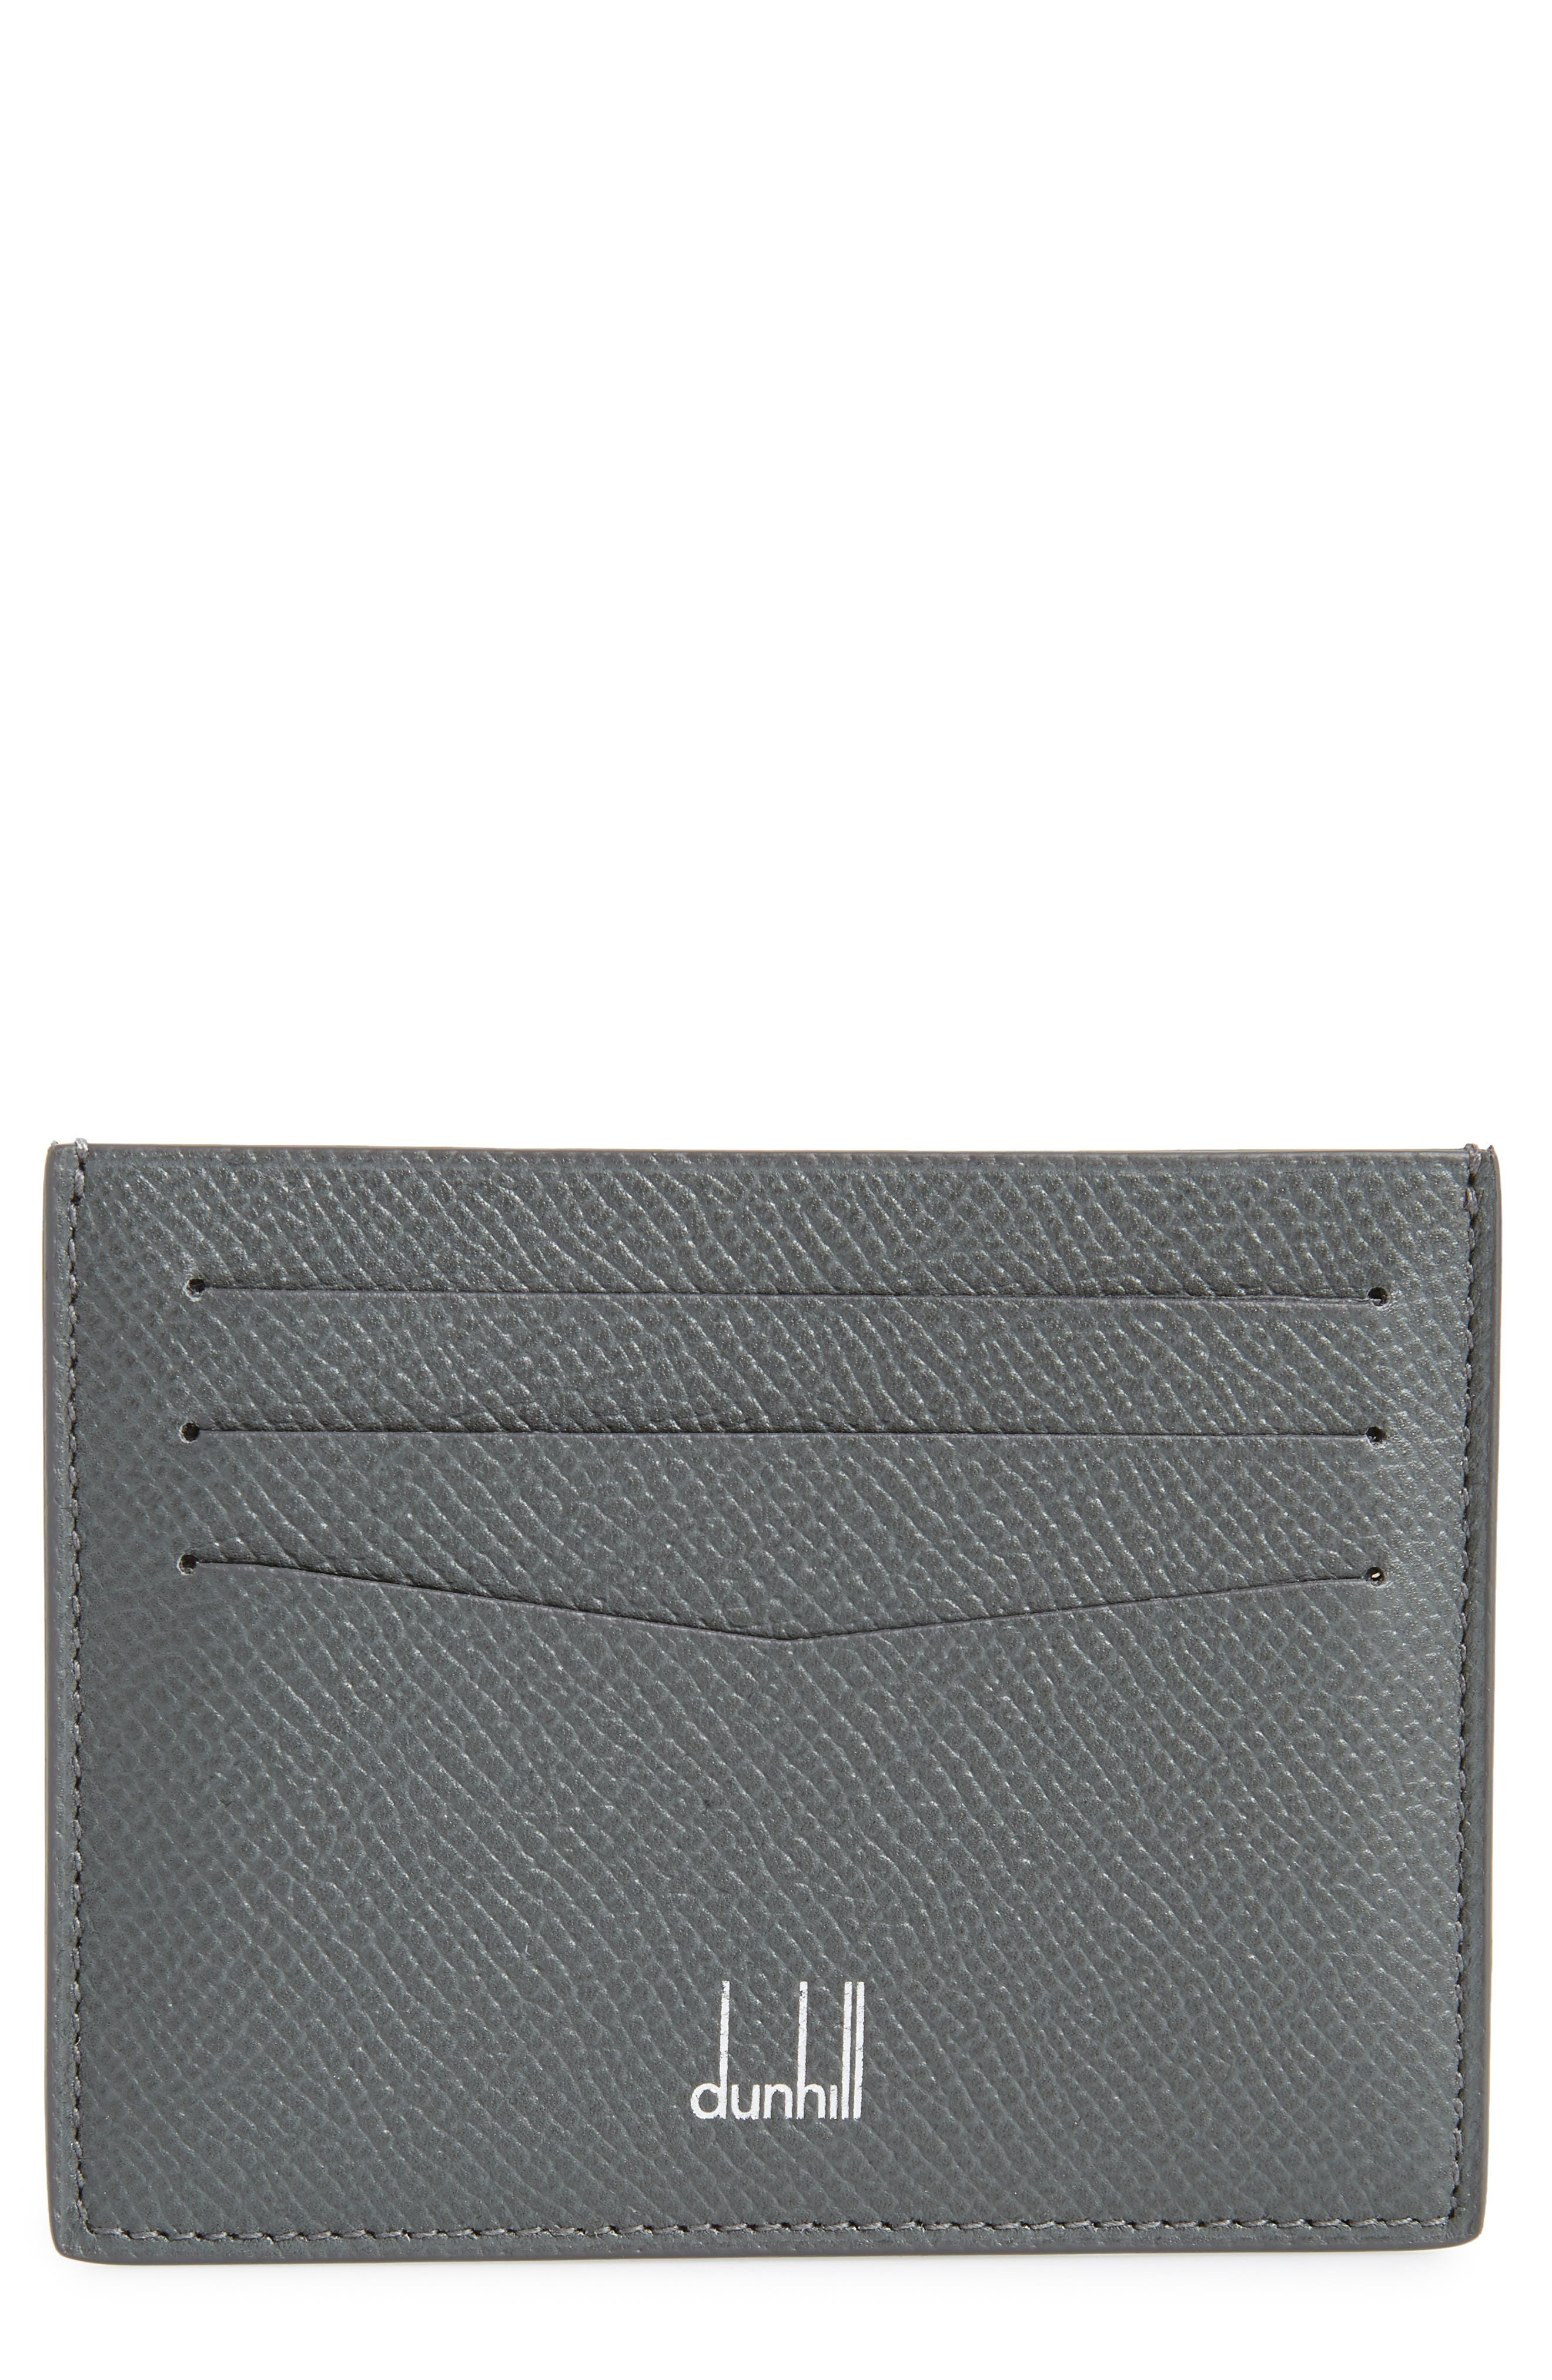 Dunhill Cadogan Leather Card Case - Grey